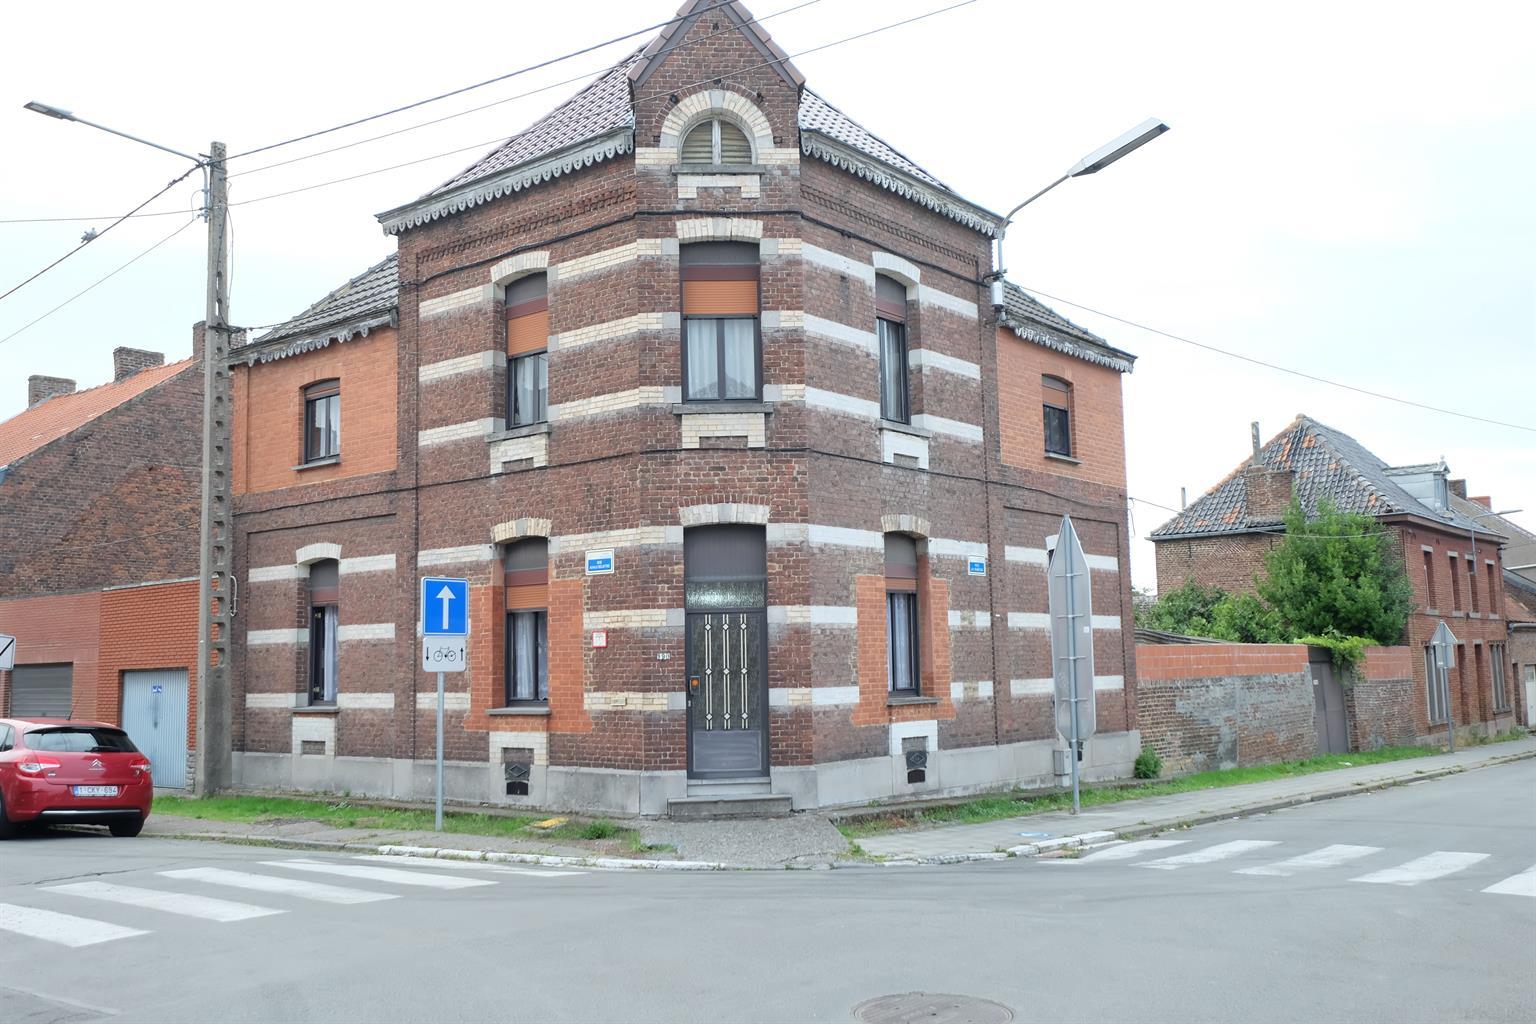 Maison - Colfontaine - #4501144-0